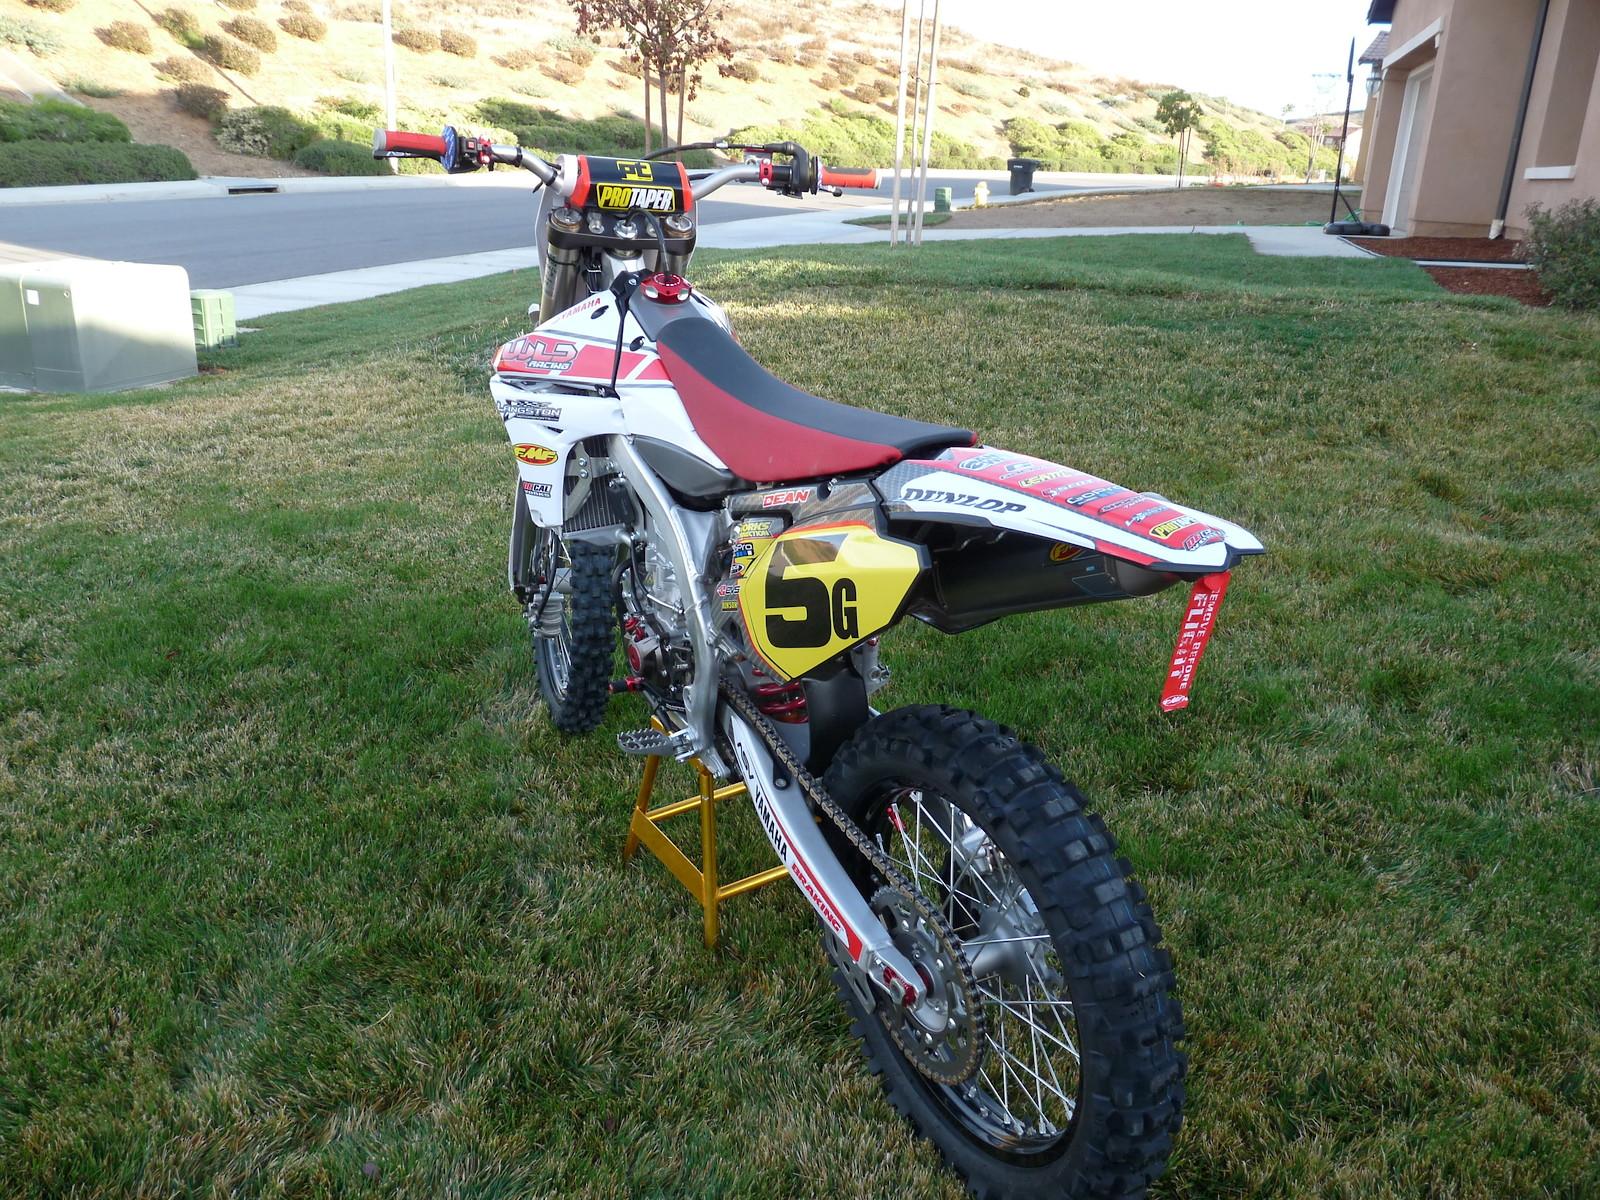 P1230523 - WLD - Motocross Pictures - Vital MX